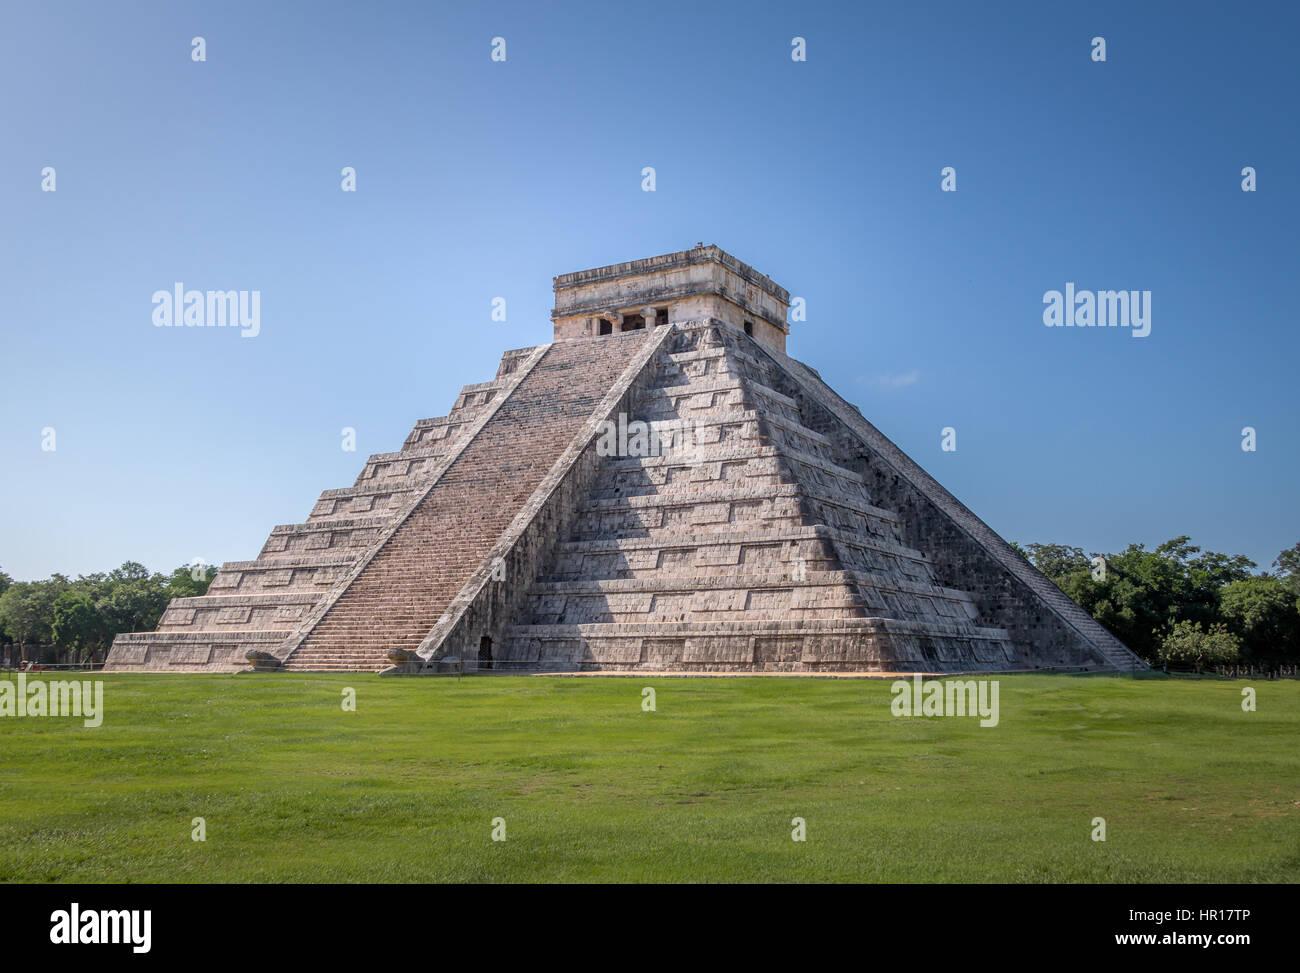 Mayan Temple pyramid of Kukulkan - Chichen Itza, Yucatan, Mexico - Stock Image